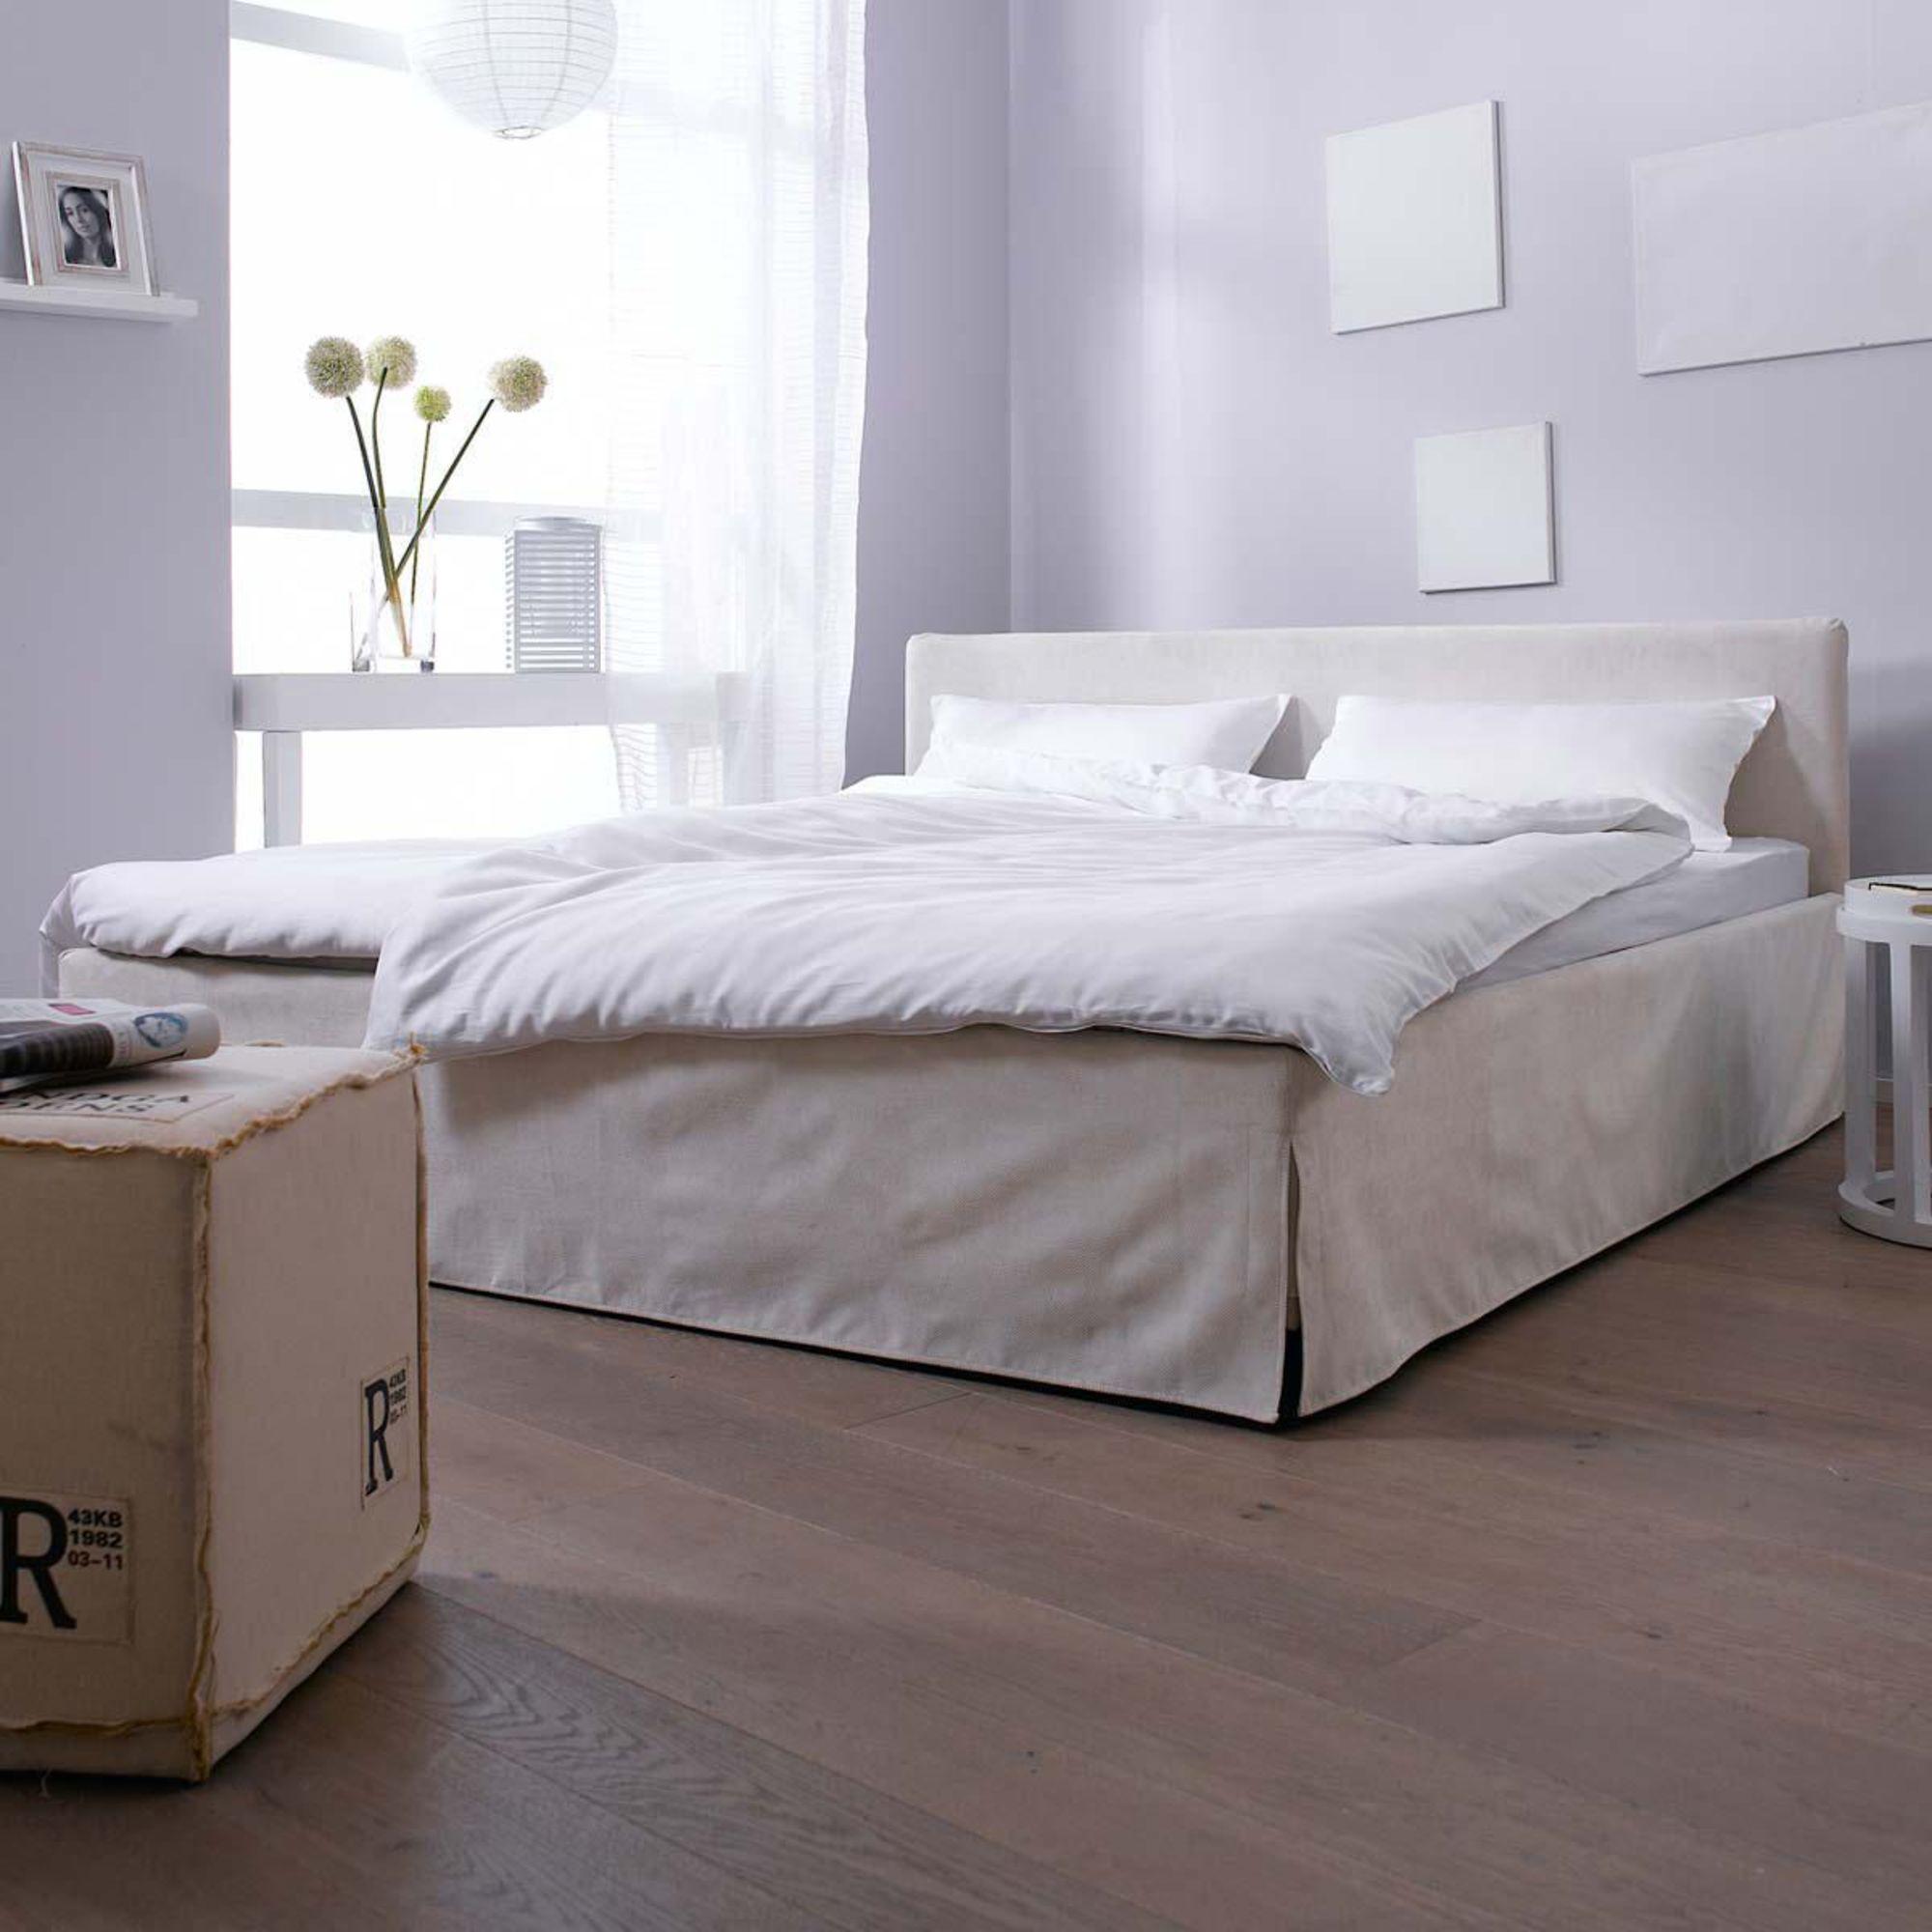 betten massivholz stecksystem mit bettkasten. Black Bedroom Furniture Sets. Home Design Ideas